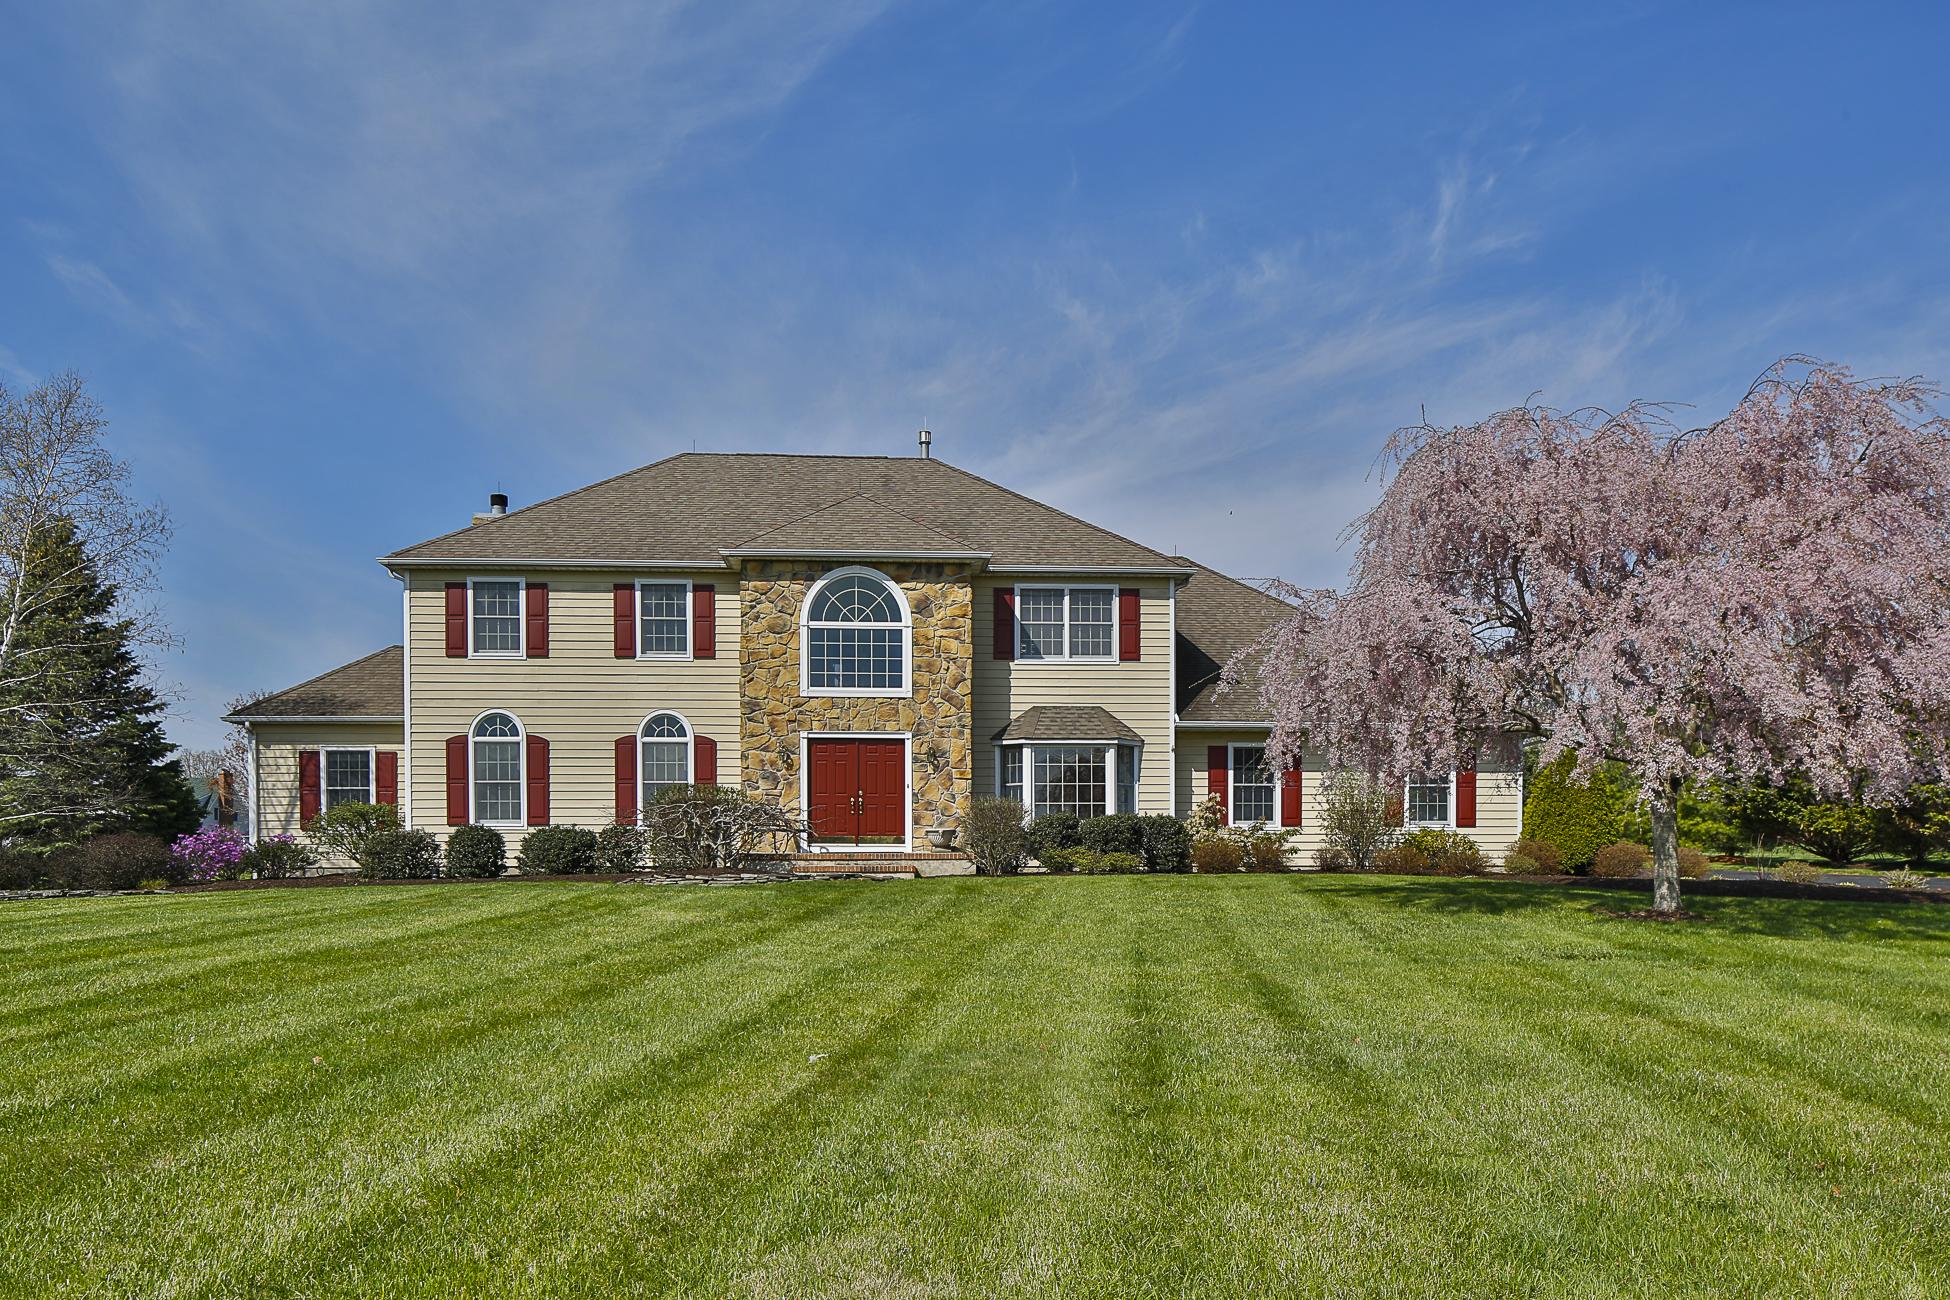 独户住宅 为 销售 在 Classic Center Hall Colonial - Hopewell Township 10 Madaket Lane Pennington, 新泽西州 08534 美国